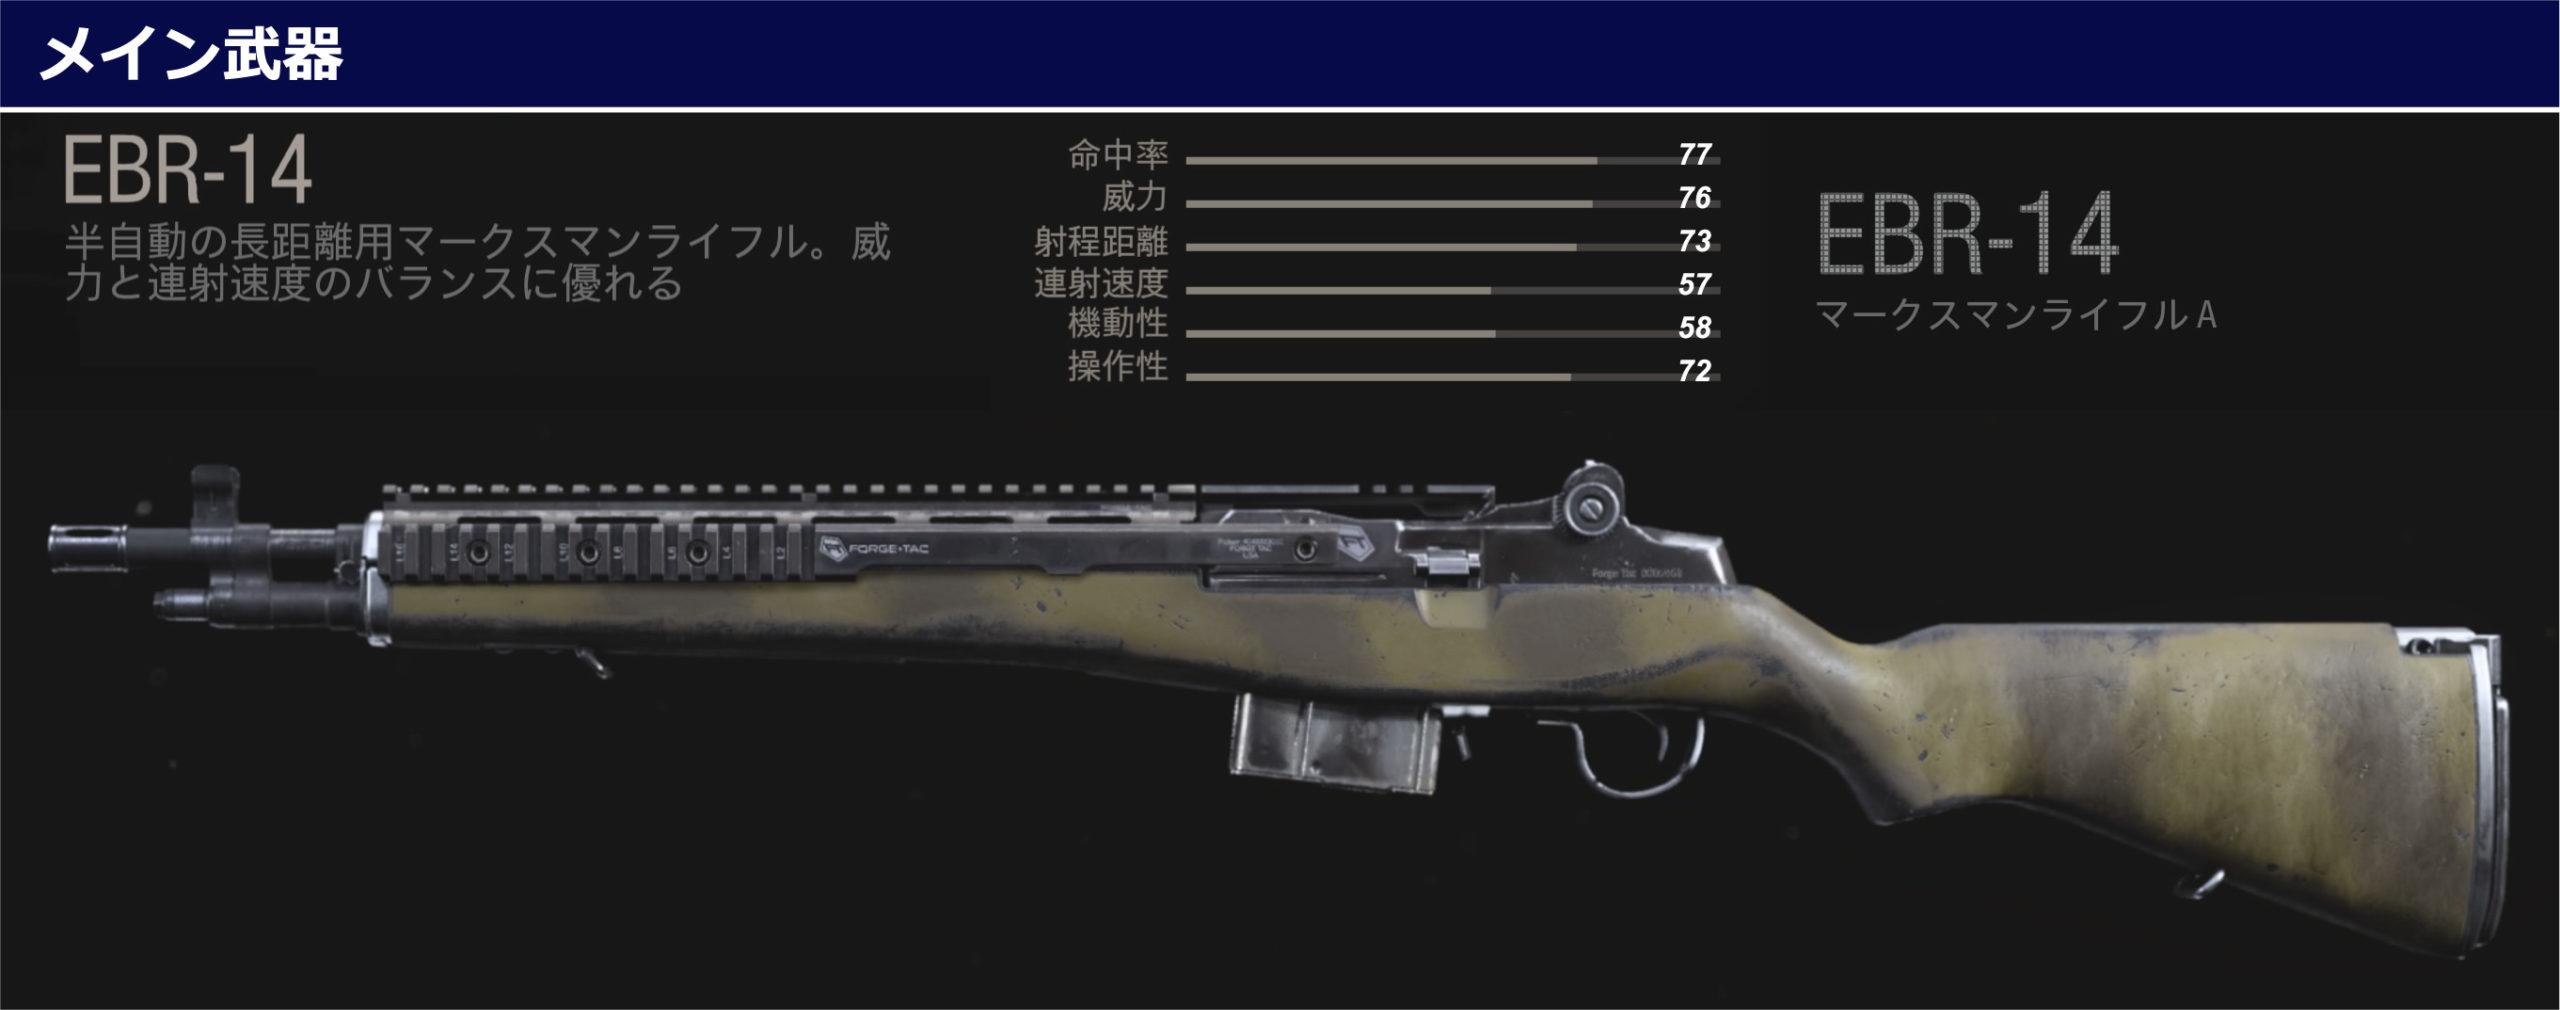 EBR-14